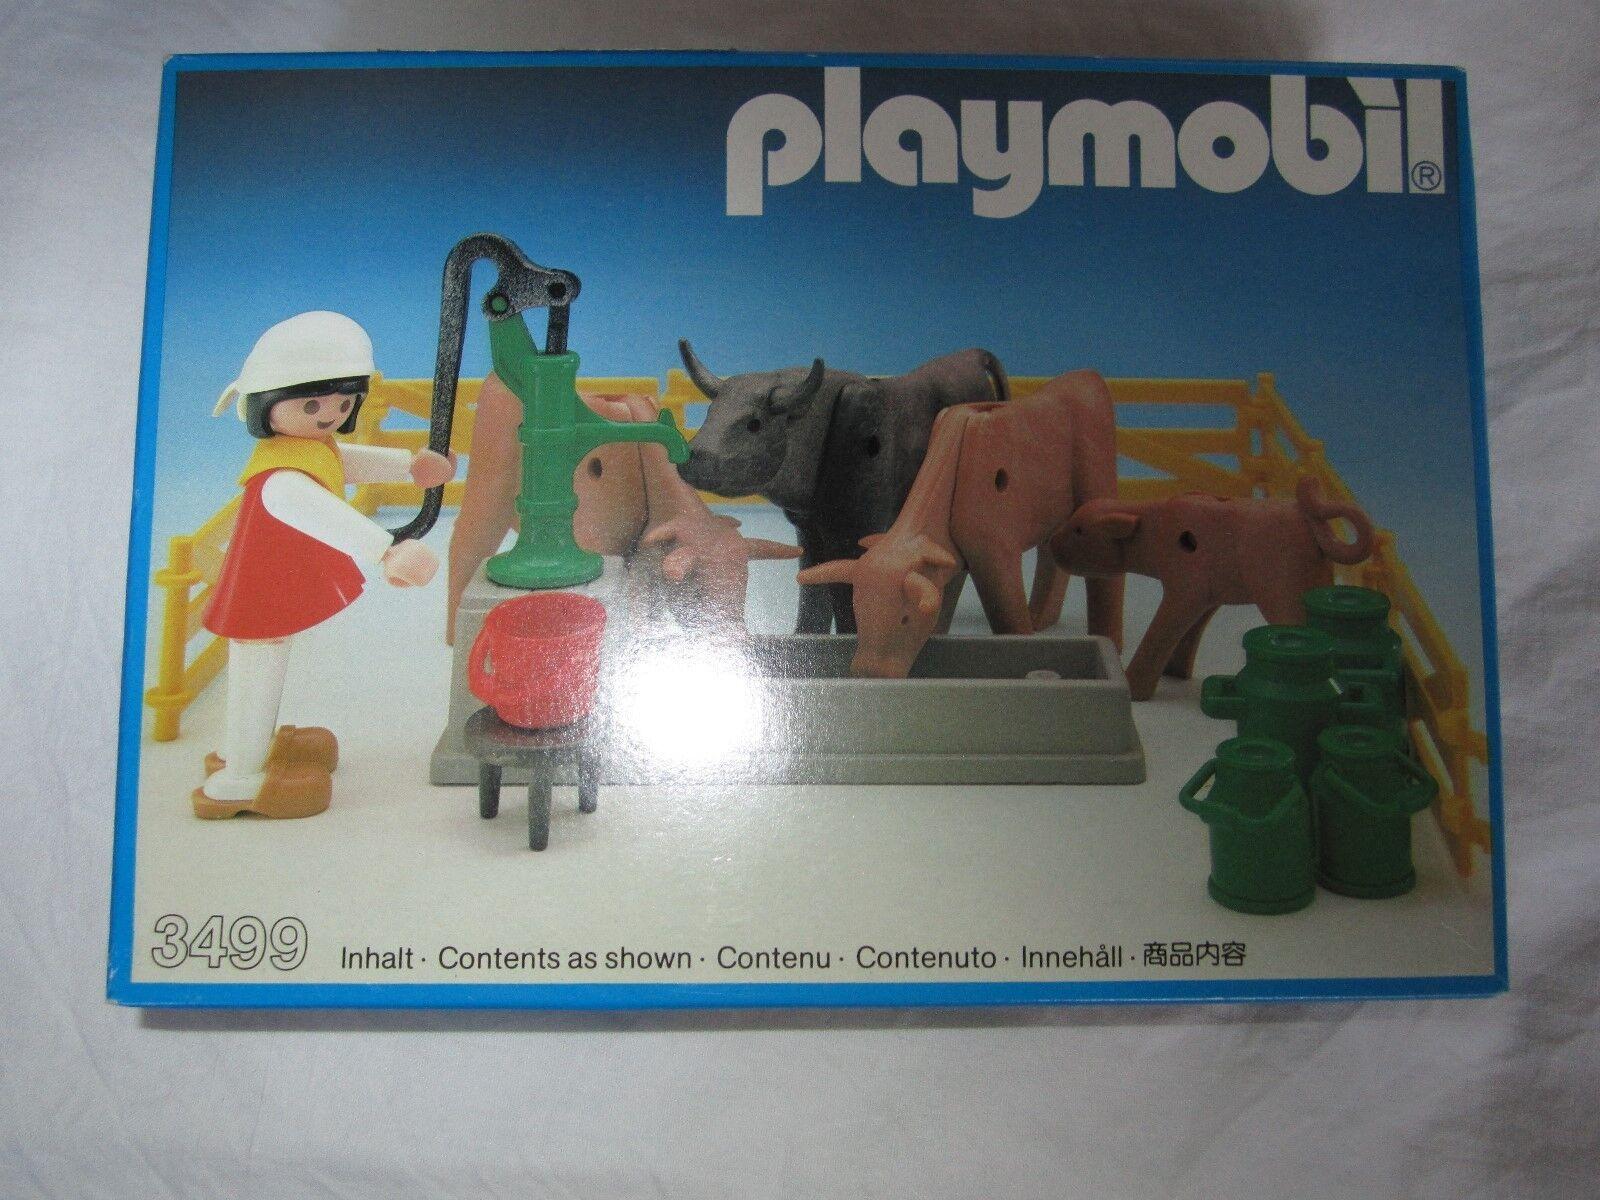 Playmobil huis boerderij house boerin met koeien 3499 3556  3500 3612 3963 nuovo  Miglior prezzo